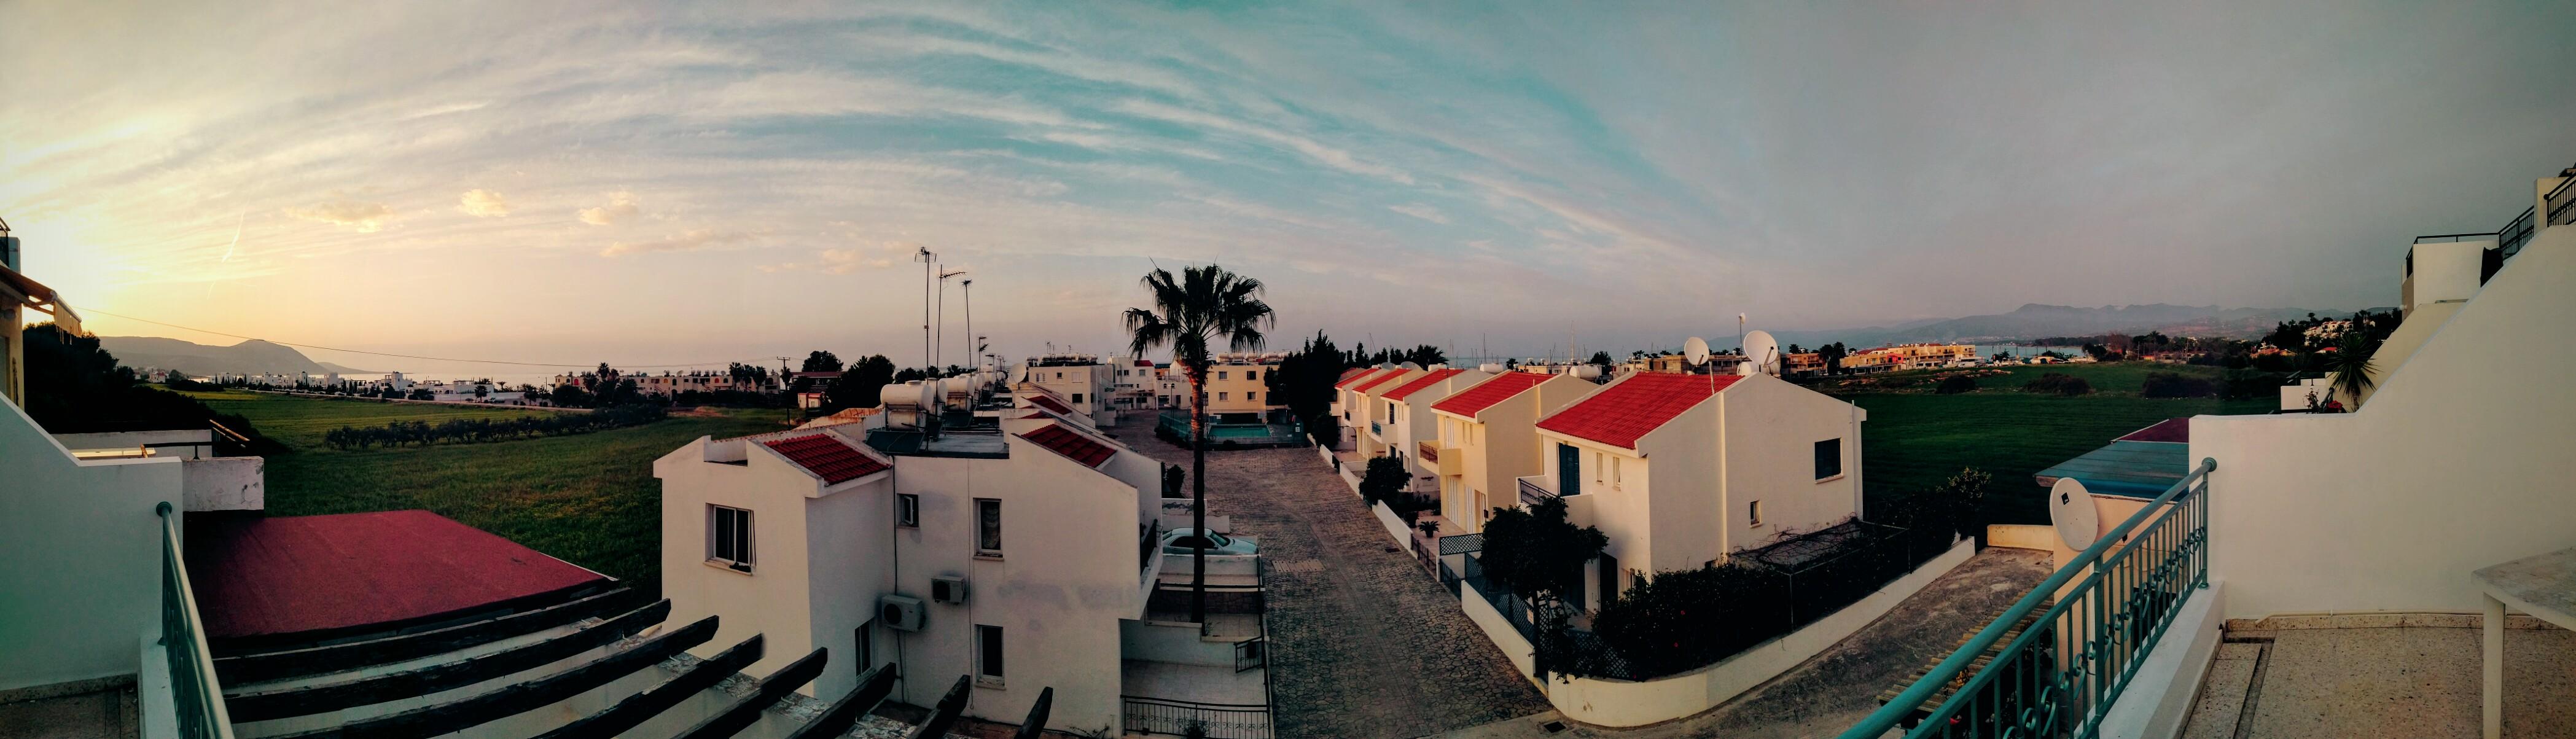 img_20160319_1745511-panorama